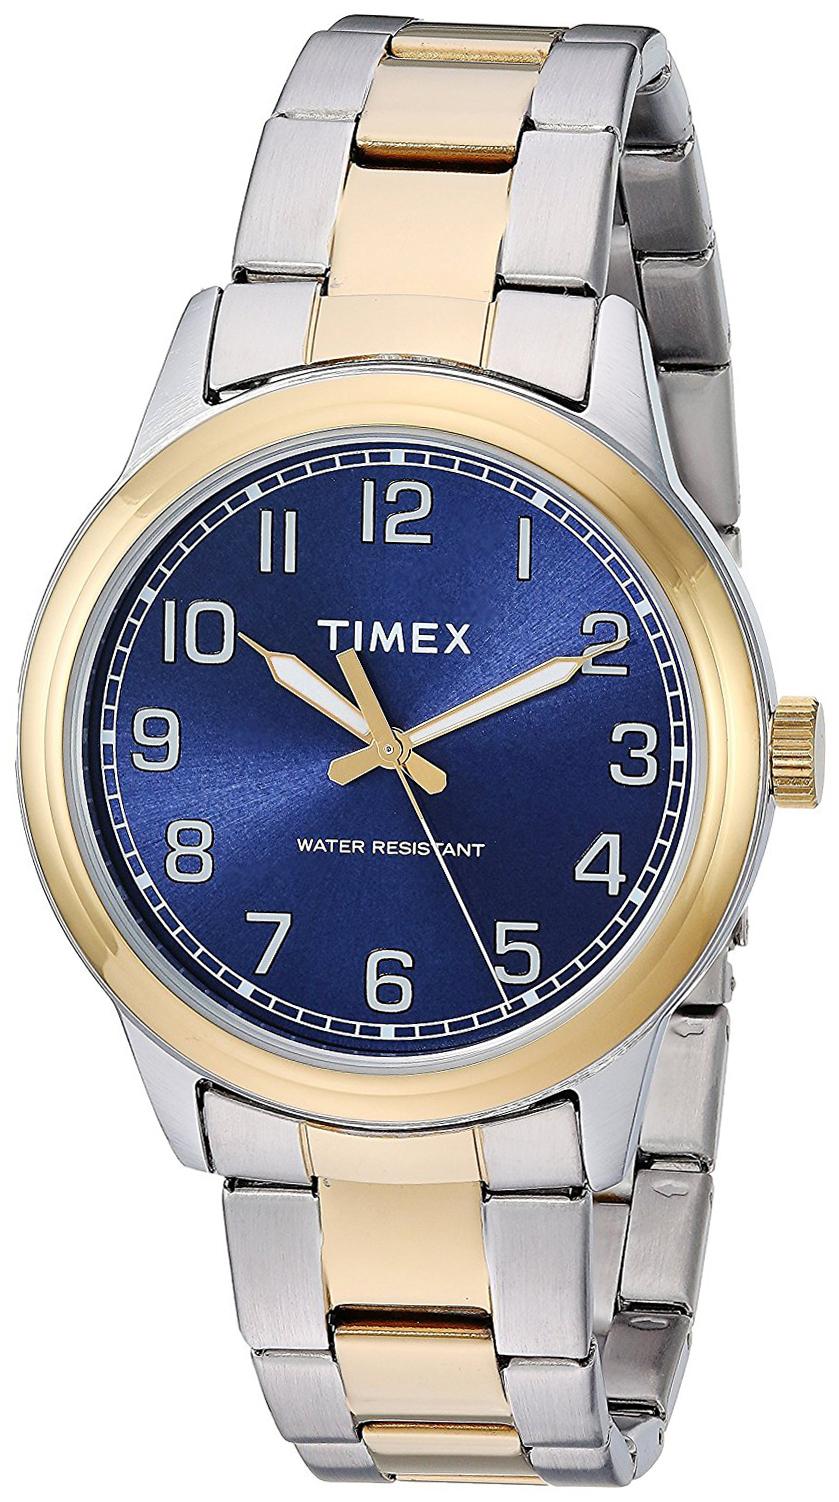 Timex 99999 Herrklocka TW2R36600 Blå/Gulguldtonat stål Ø40 mm - Timex